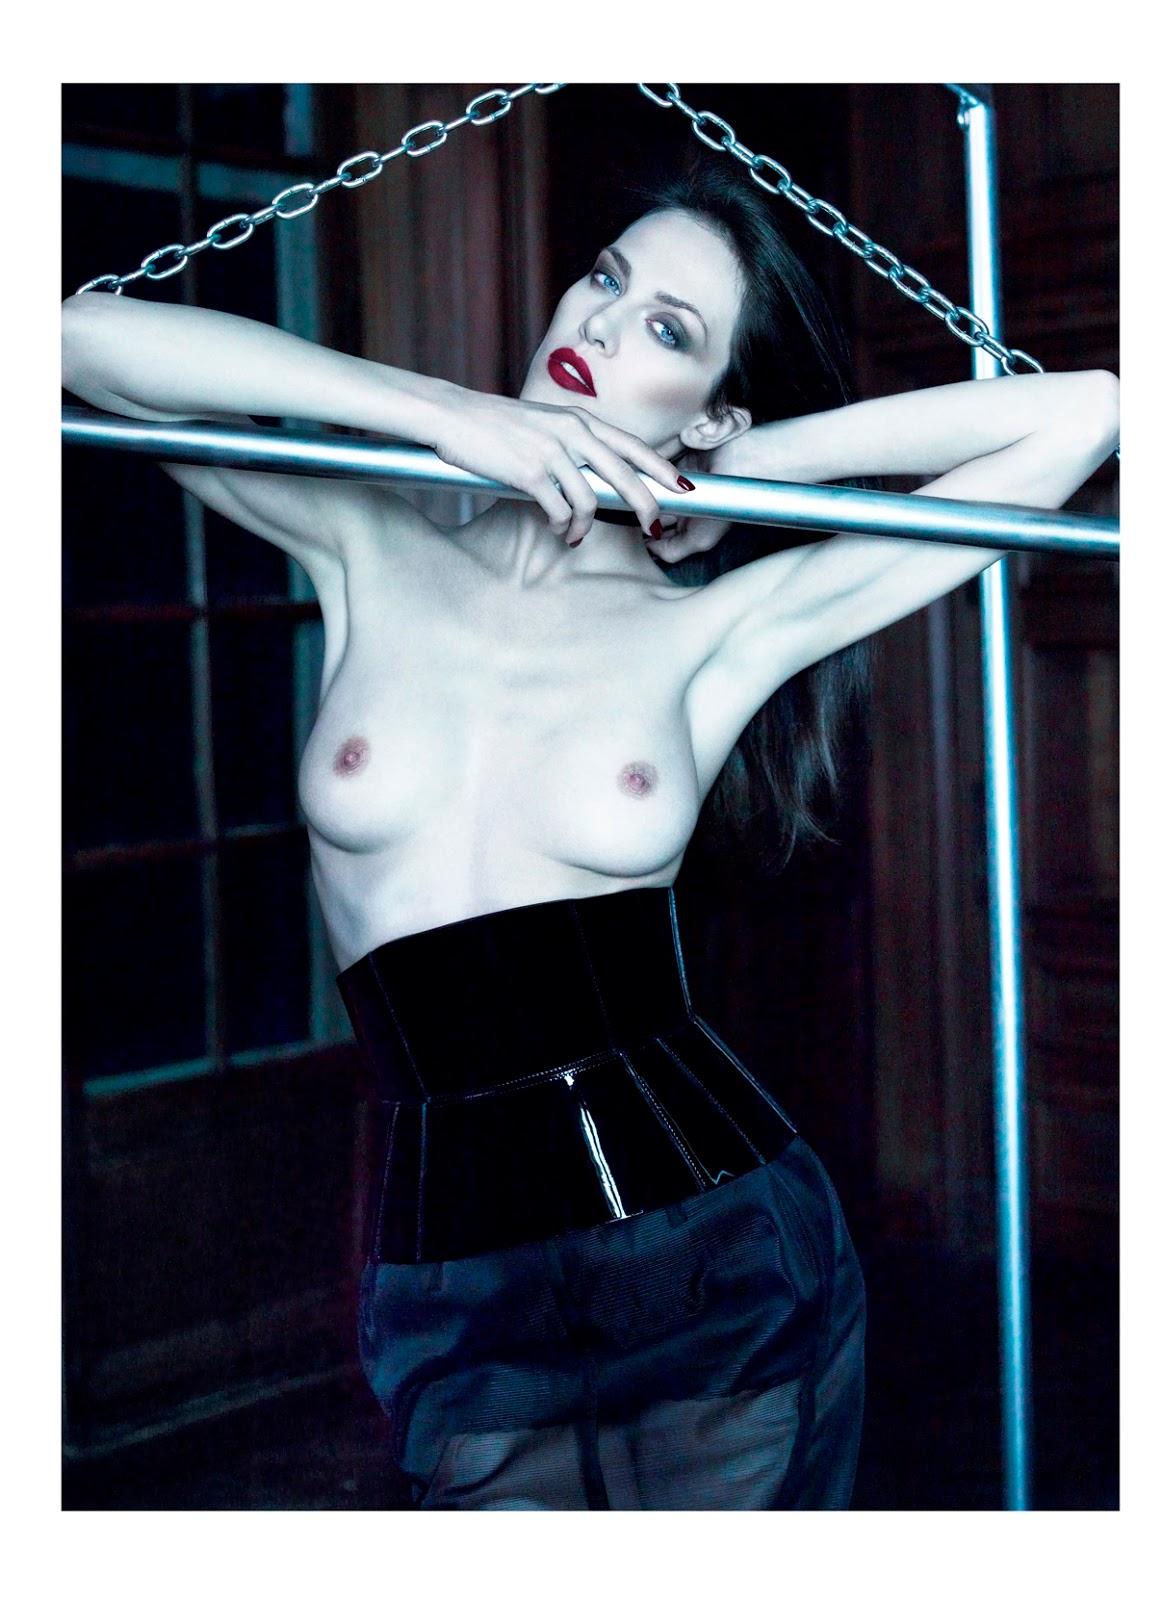 Topless Aymeline Valade nudes (51 photo), Tits, Bikini, Instagram, swimsuit 2018